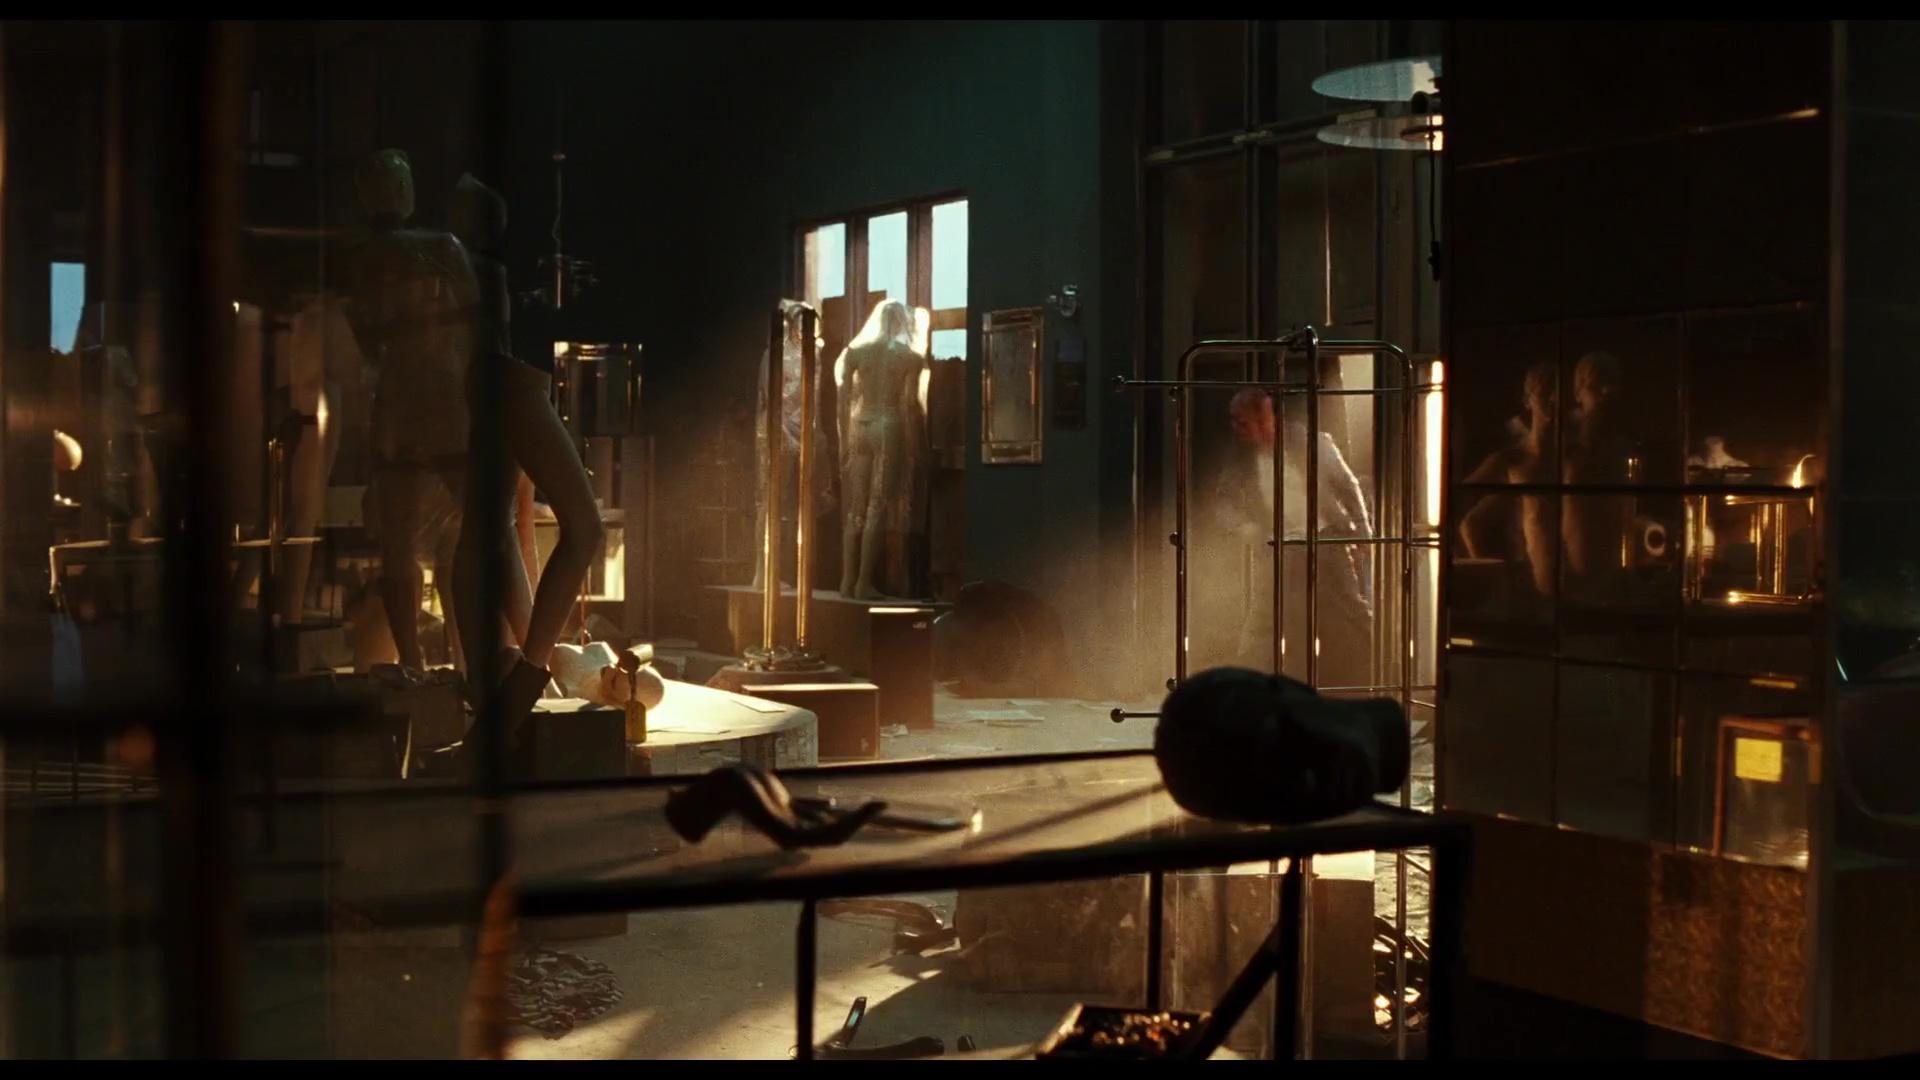 Duro De Matar 5 1080p Lat-Cast-Ing 5.1 (2013)